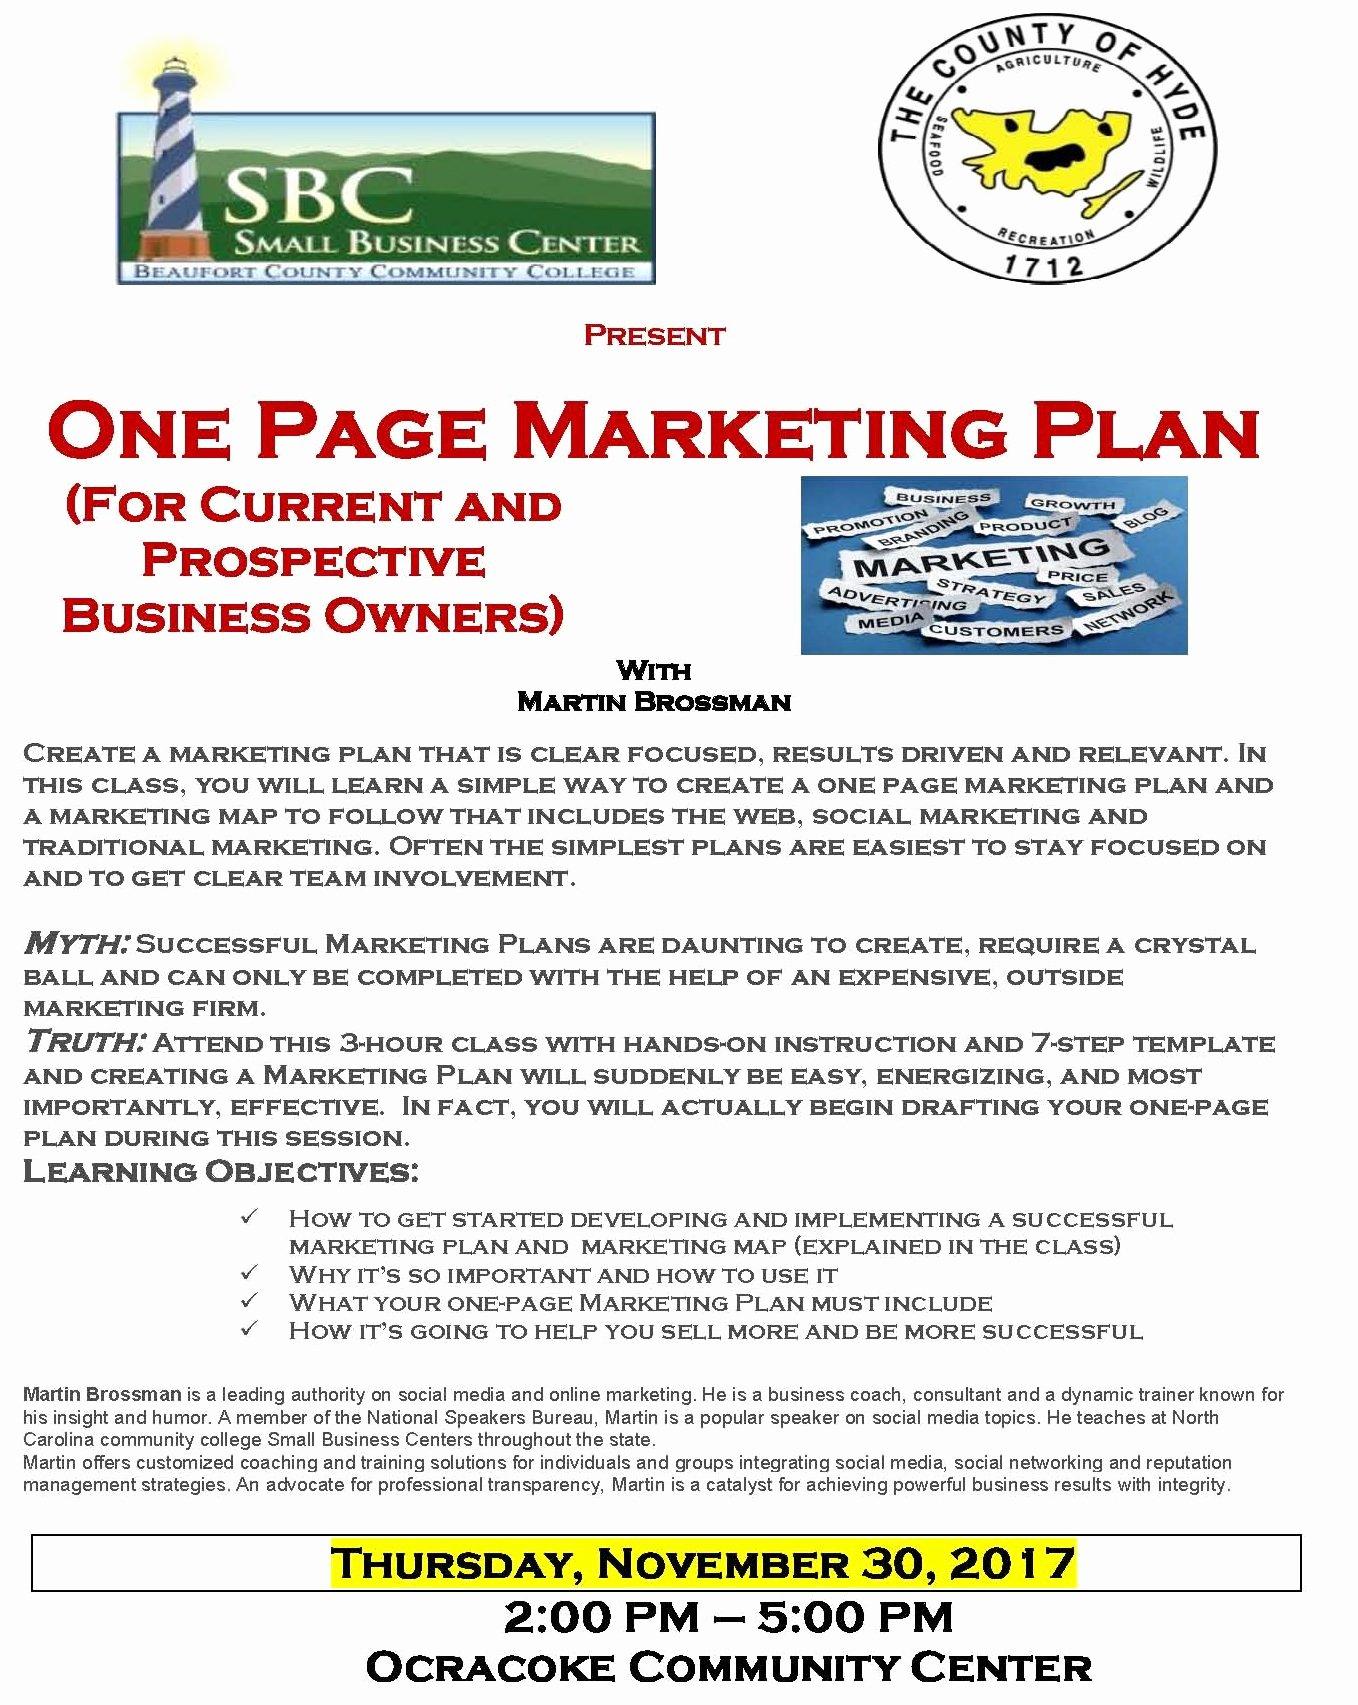 One Page Marketing Plan Elegant One Page Marketing Plan Ocracoke Ocracoke Observer